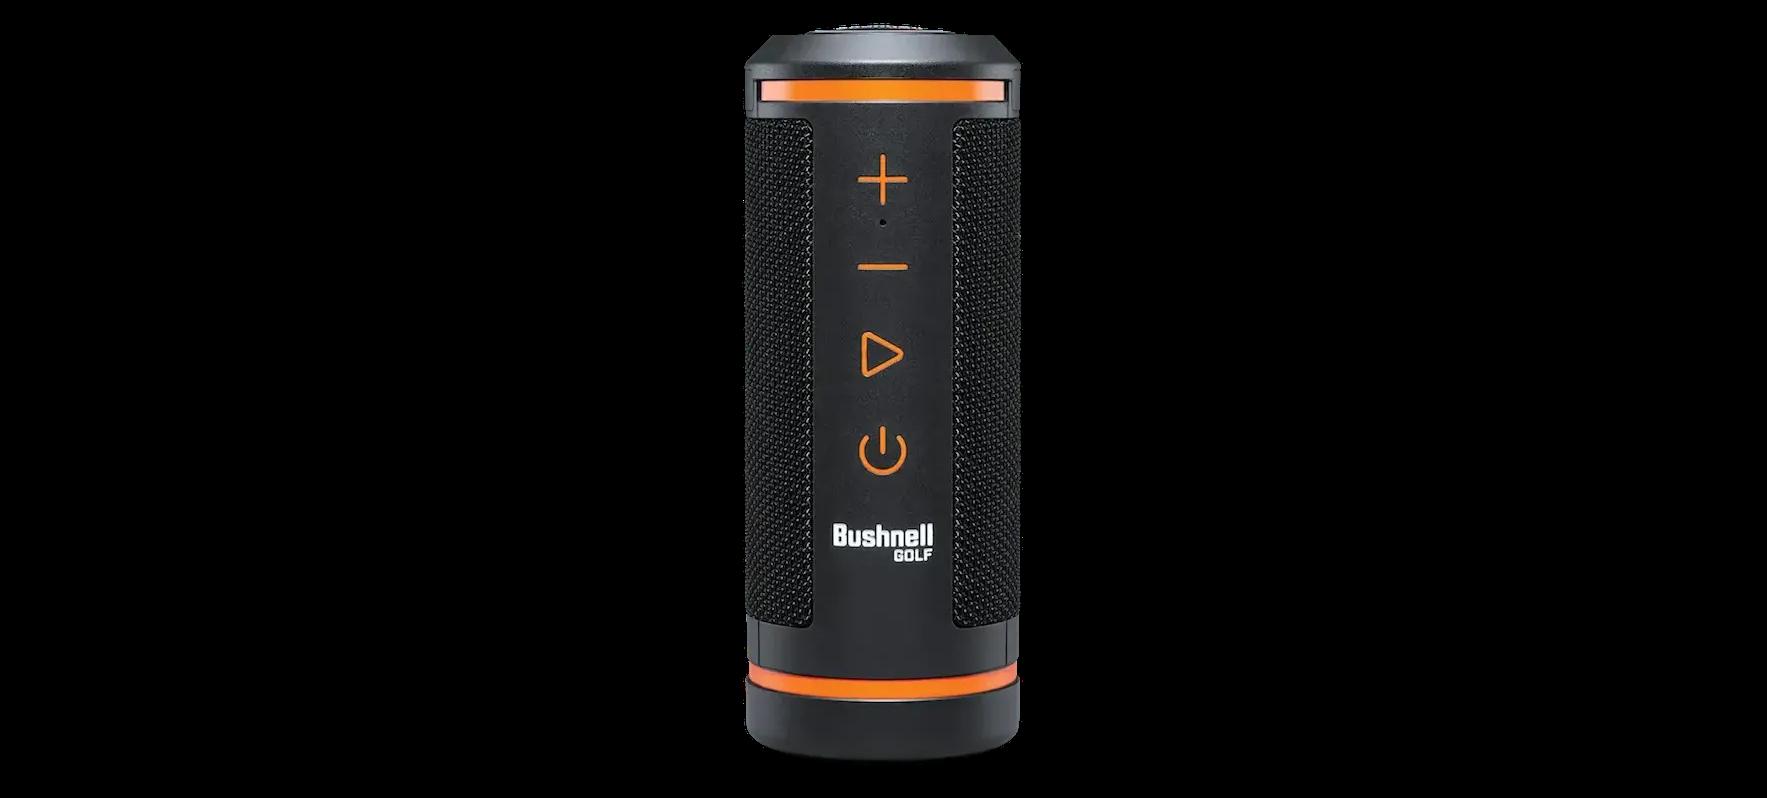 The Bushnell Hybrid golf laser rangefinder plus GPS speaker